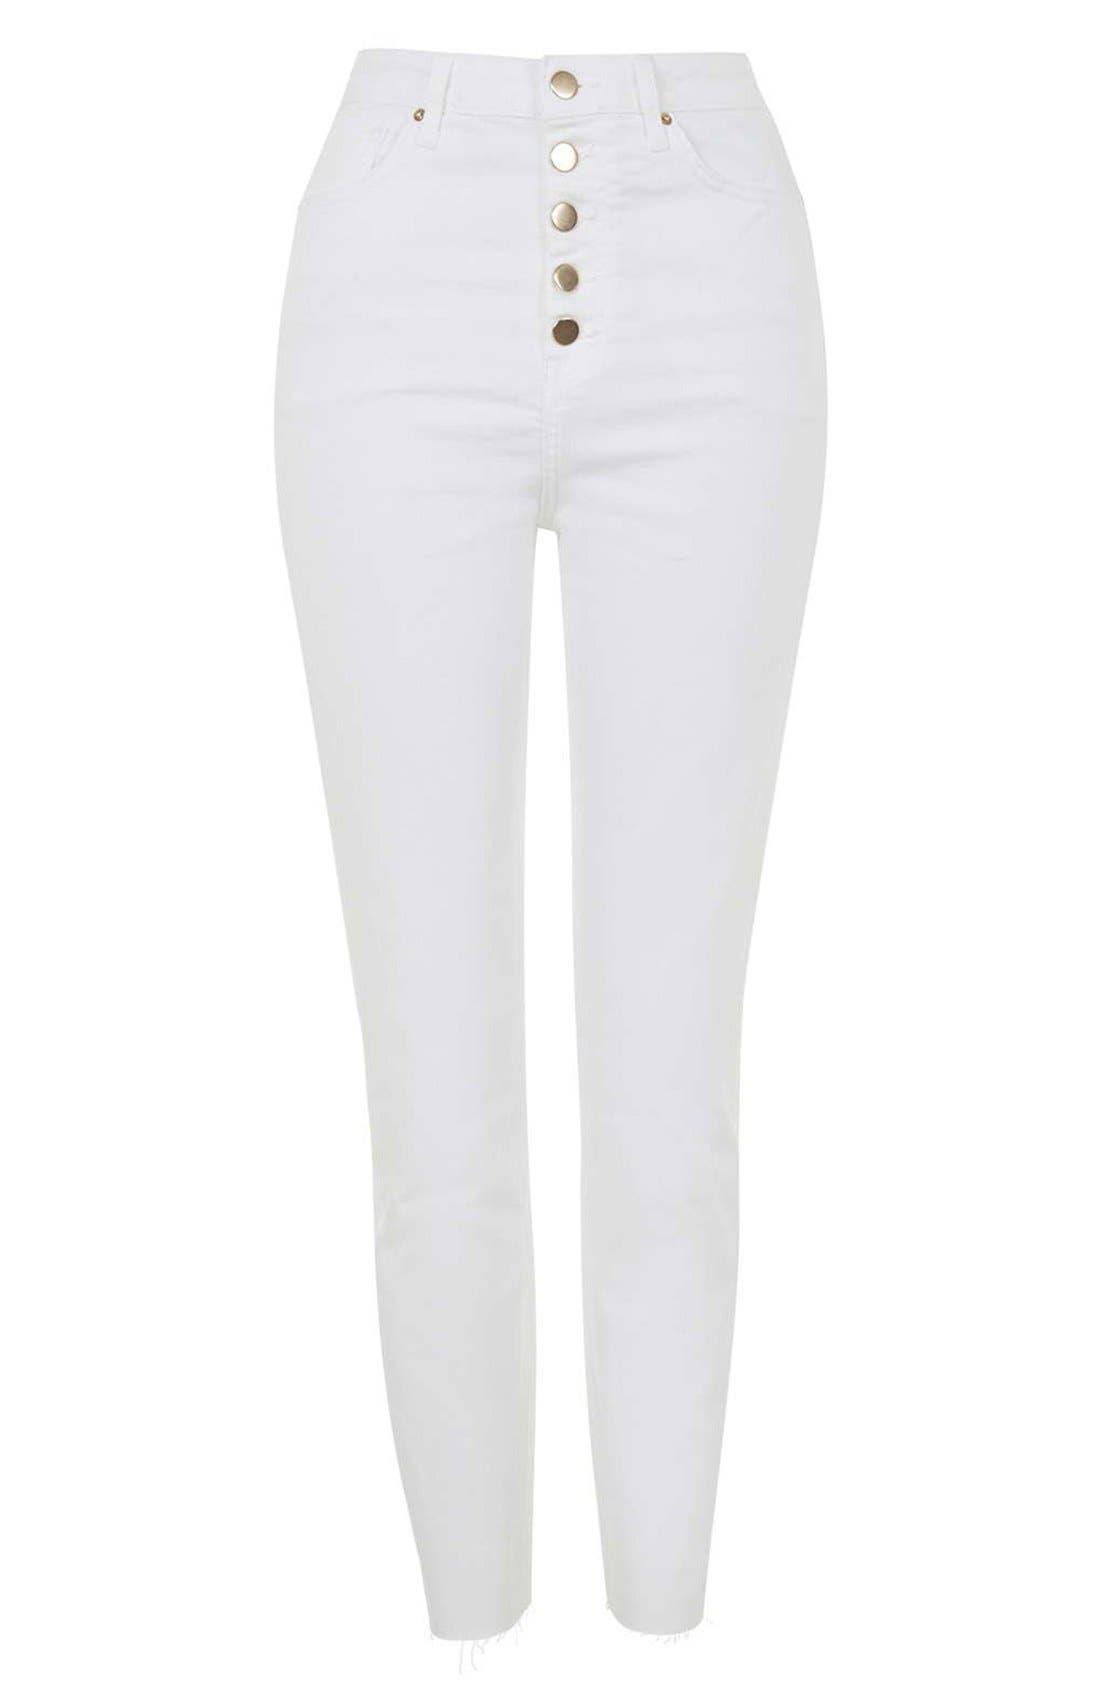 Alternate Image 3  - Topshop Moto 'Binx' Button Front Slim Jeans (White)